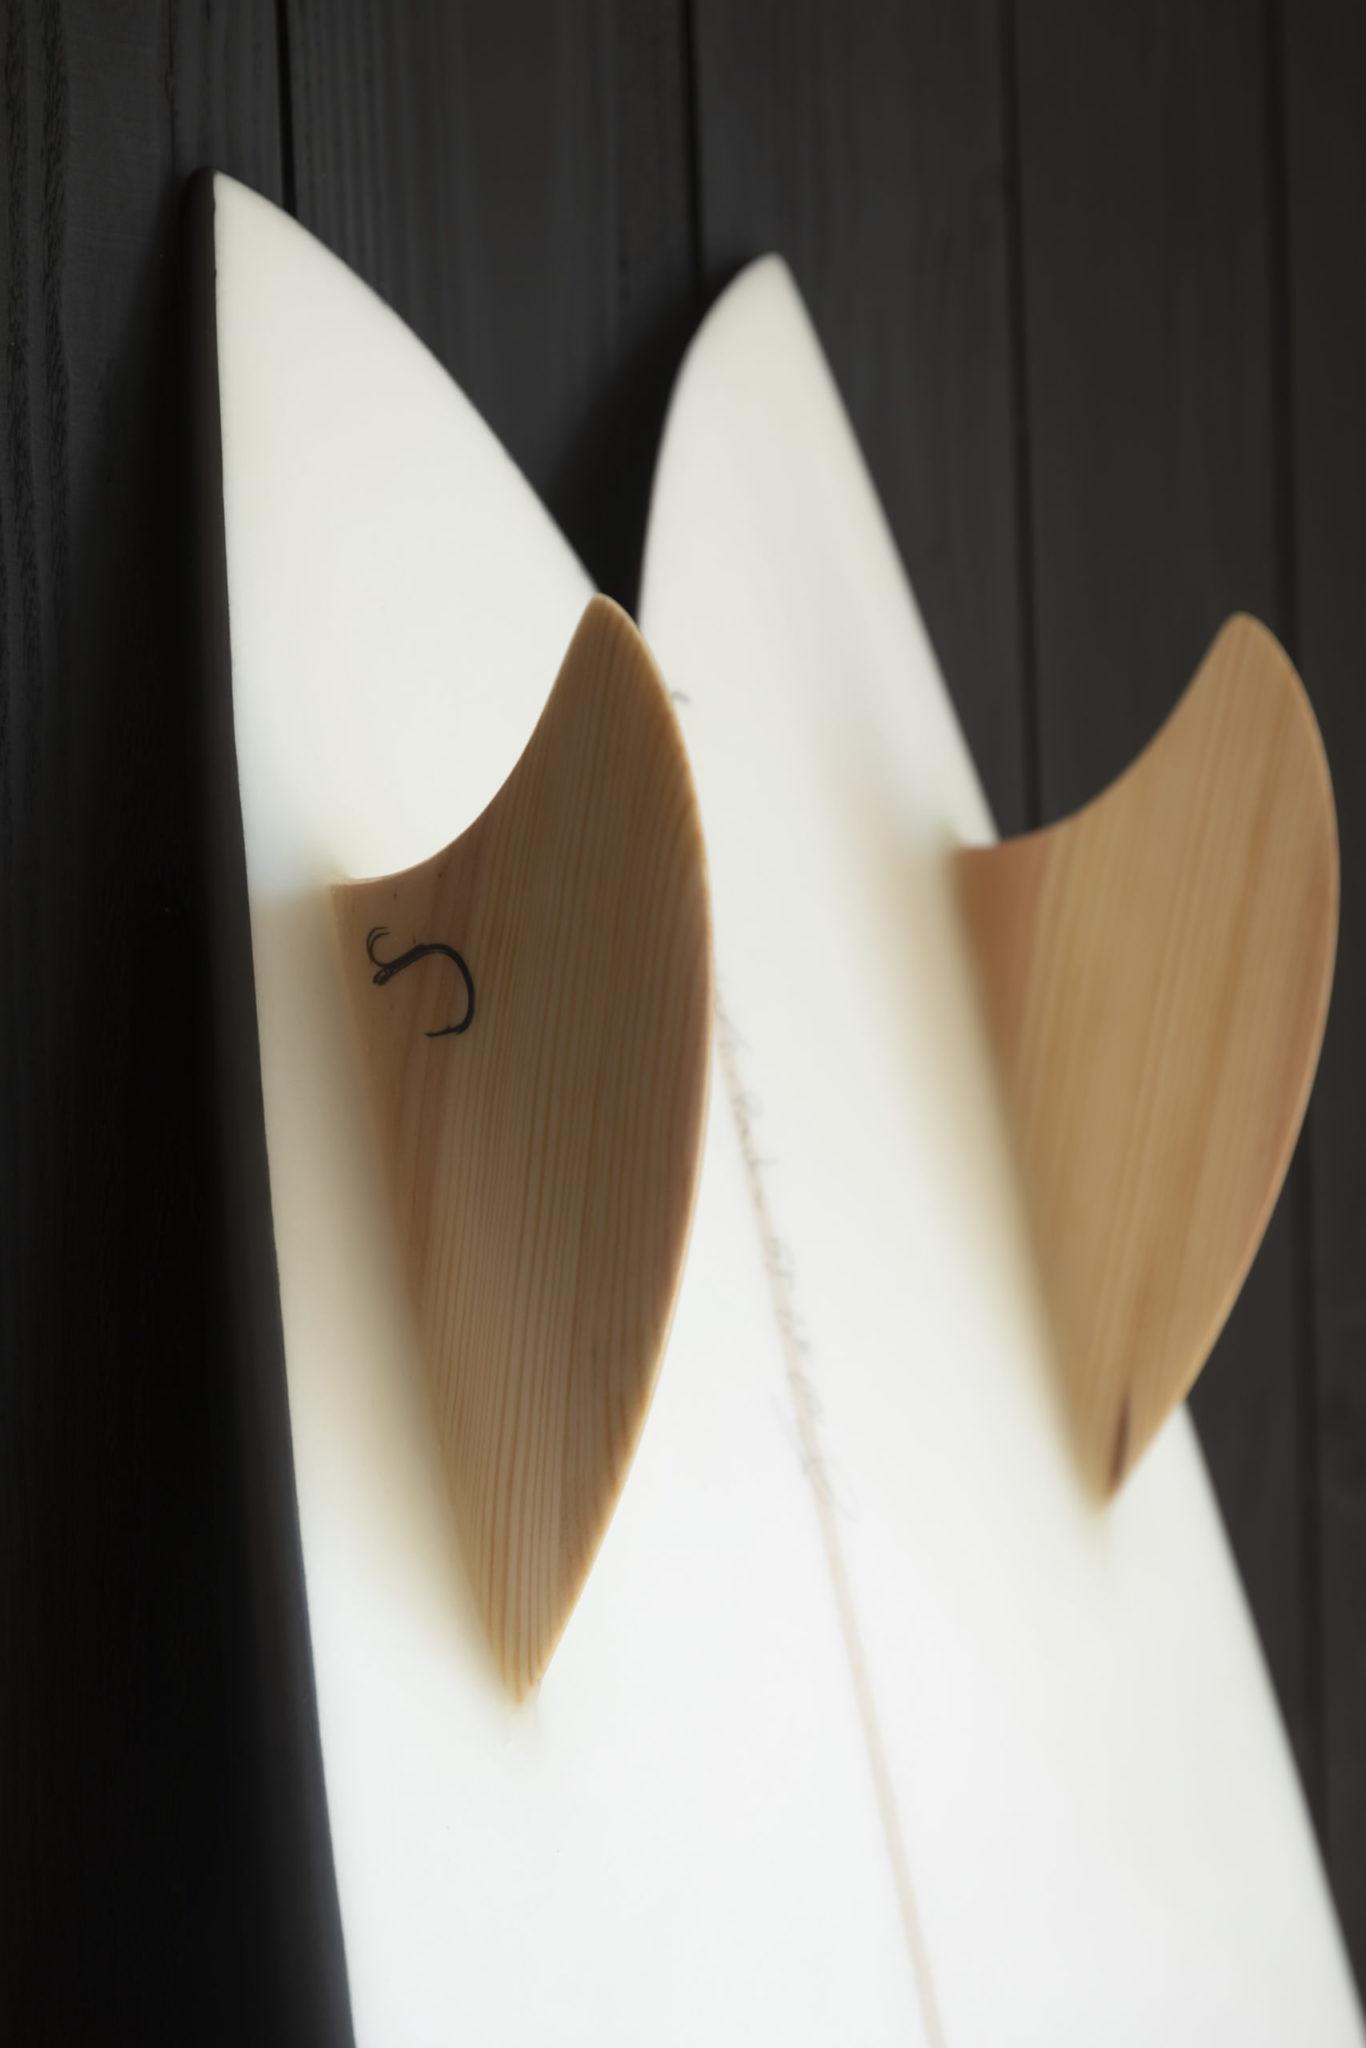 cachalot surfboards planche surf handmade artisan shaper hollow bois scorbut Julien Mavier